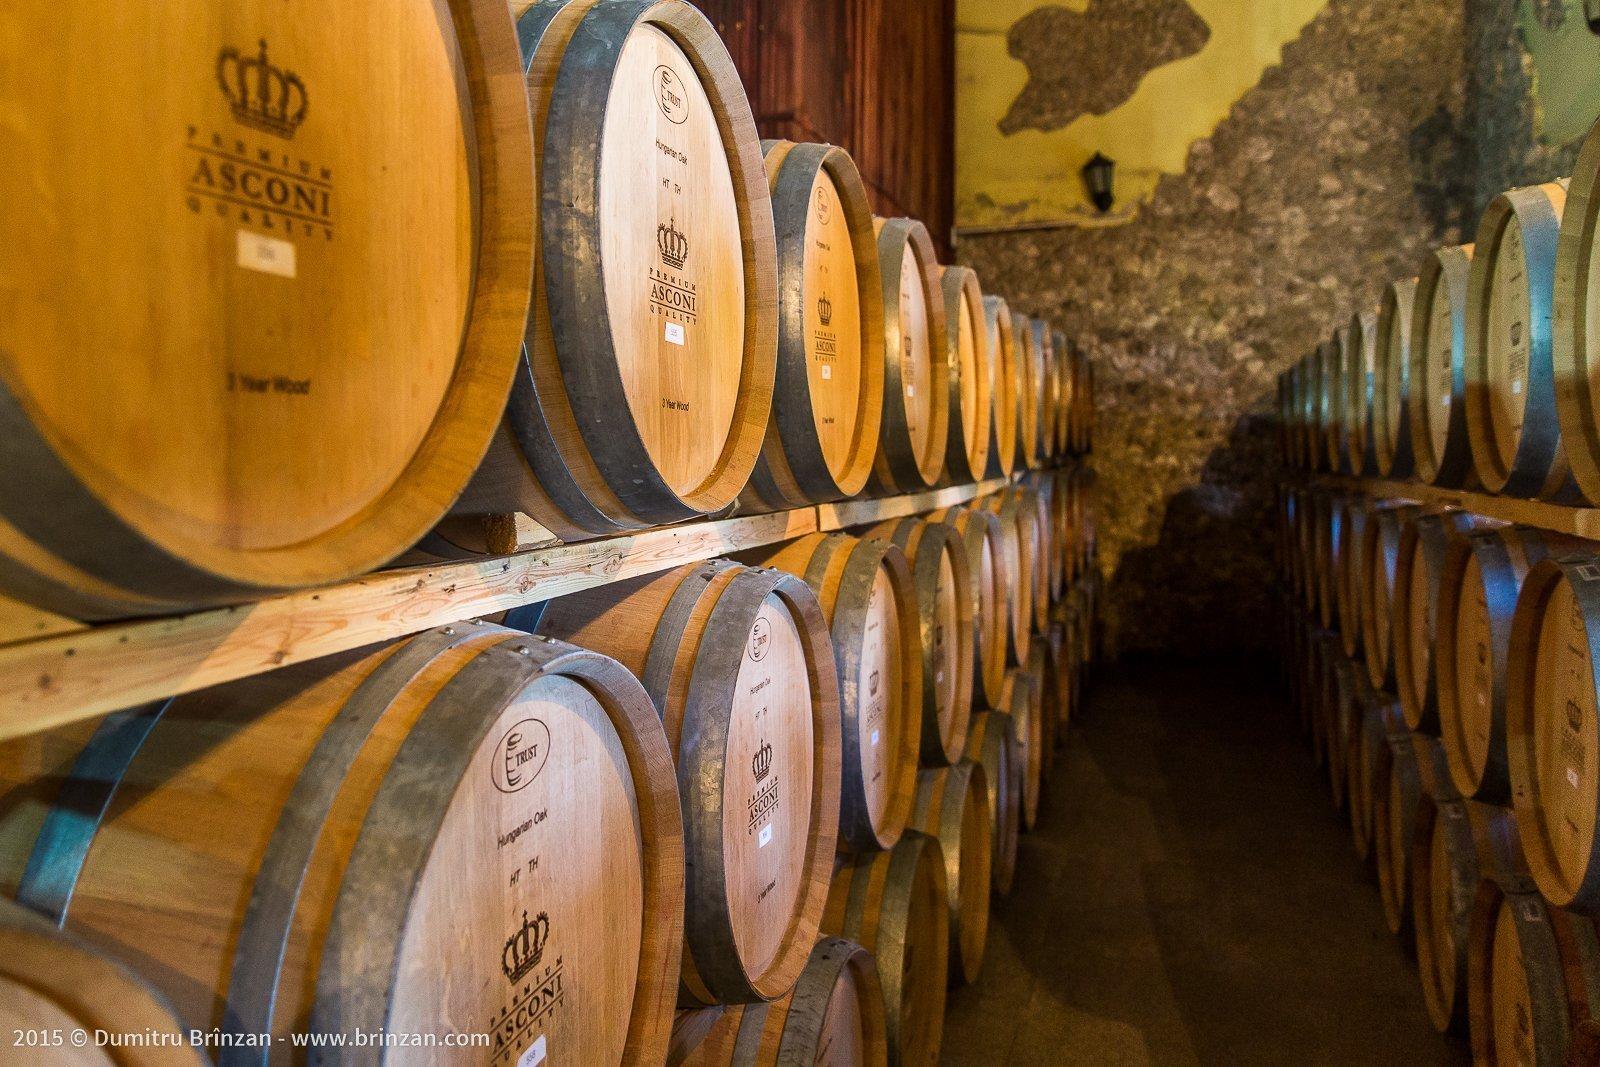 Asconi Winery in Puhoi Village, Moldova - American Oak Barriques